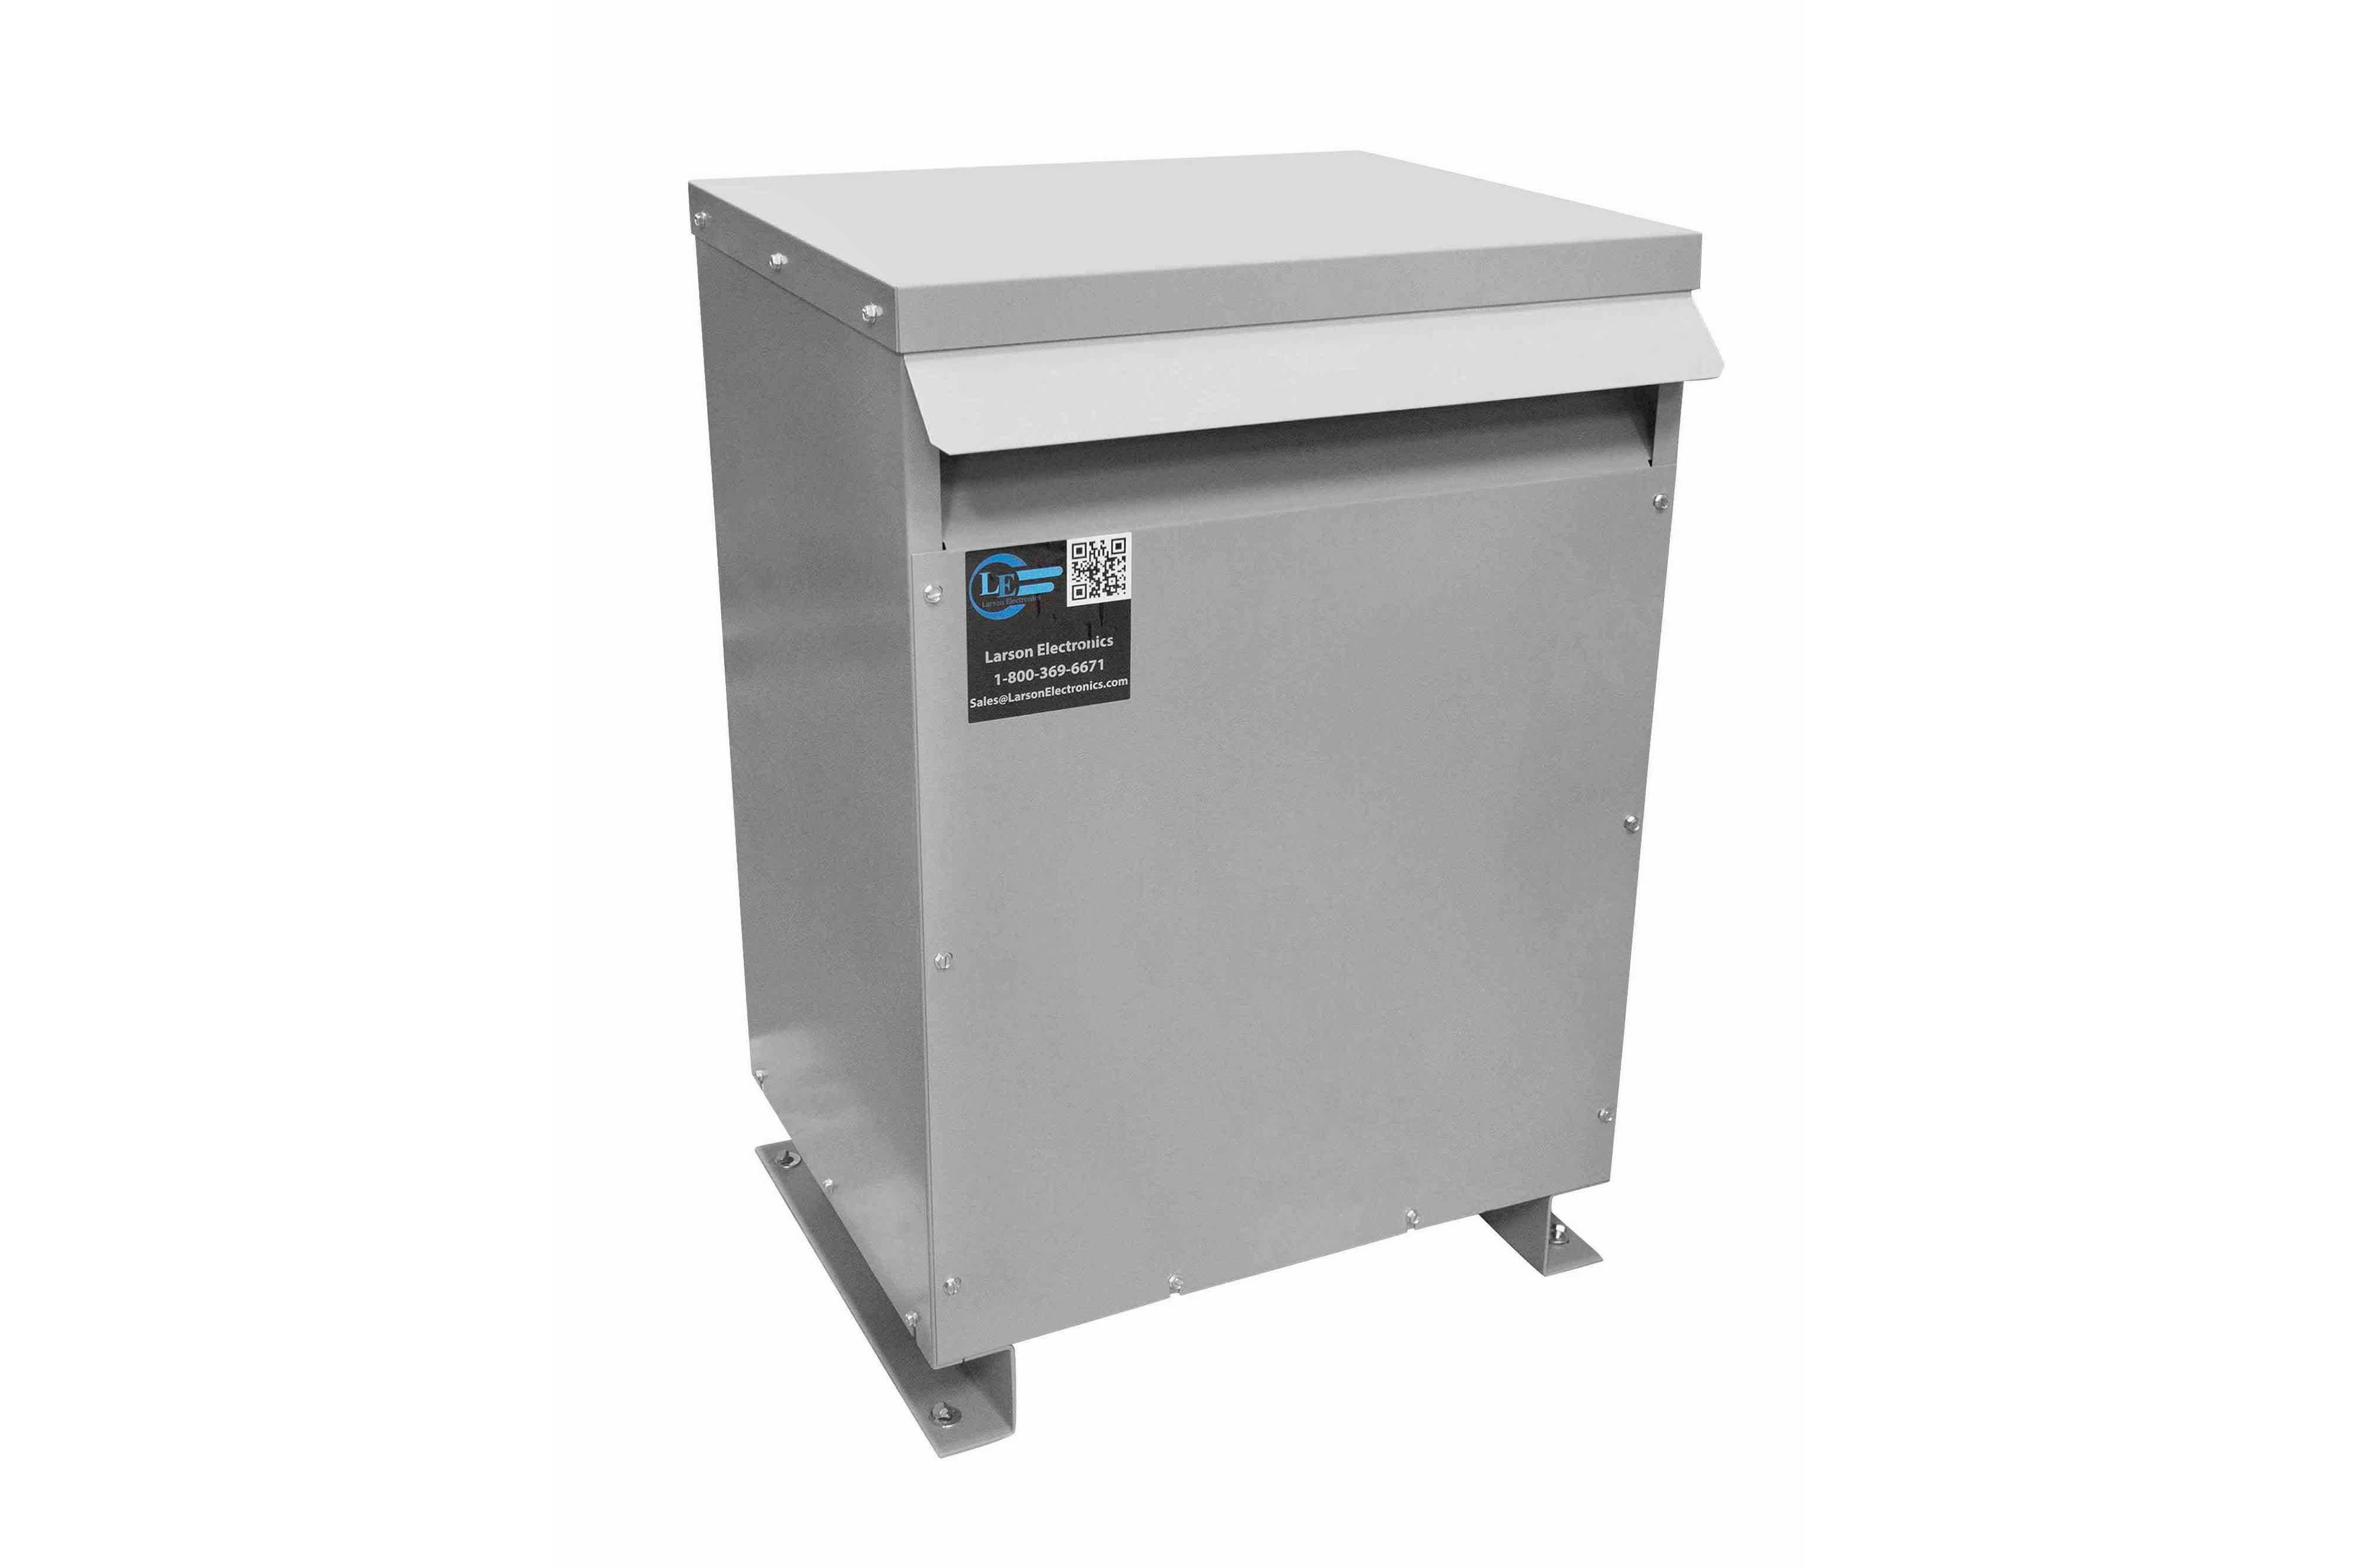 55 kVA 3PH Isolation Transformer, 208V Wye Primary, 600V Delta Secondary, N3R, Ventilated, 60 Hz